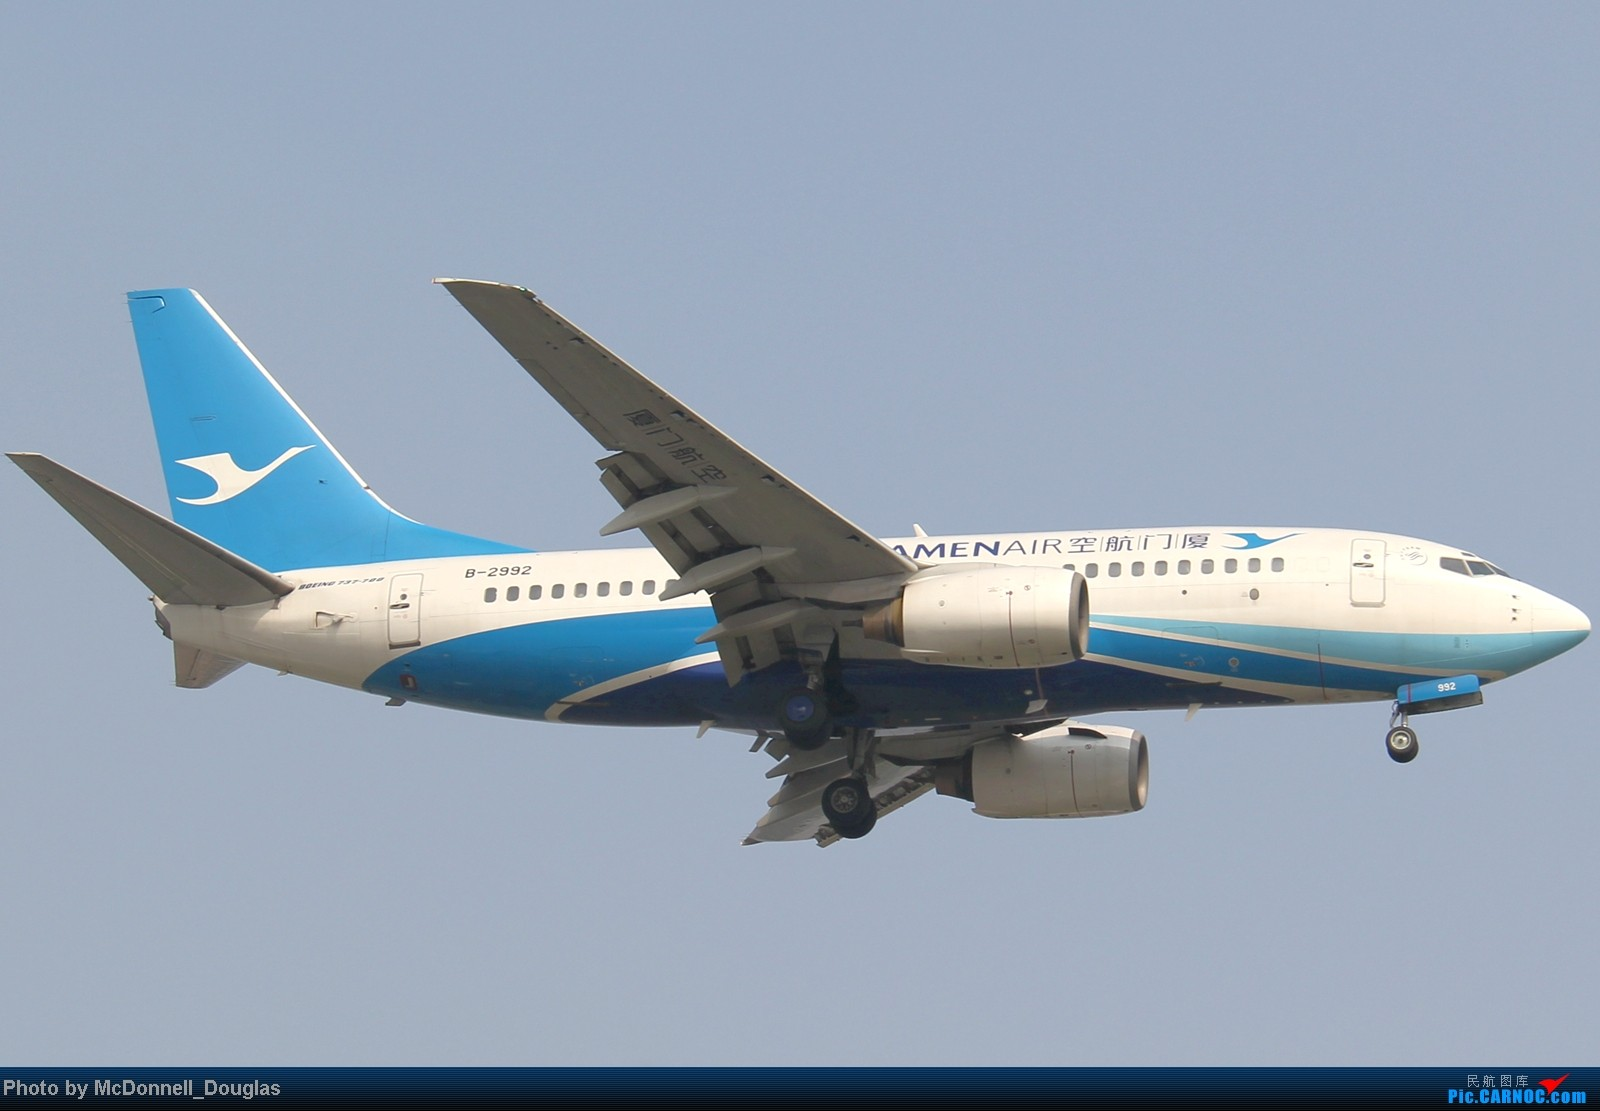 Re:[原创]【上海飞友会】ZSSS杂图一组 BOEING 737-700 B-2992 中国上海虹桥机场